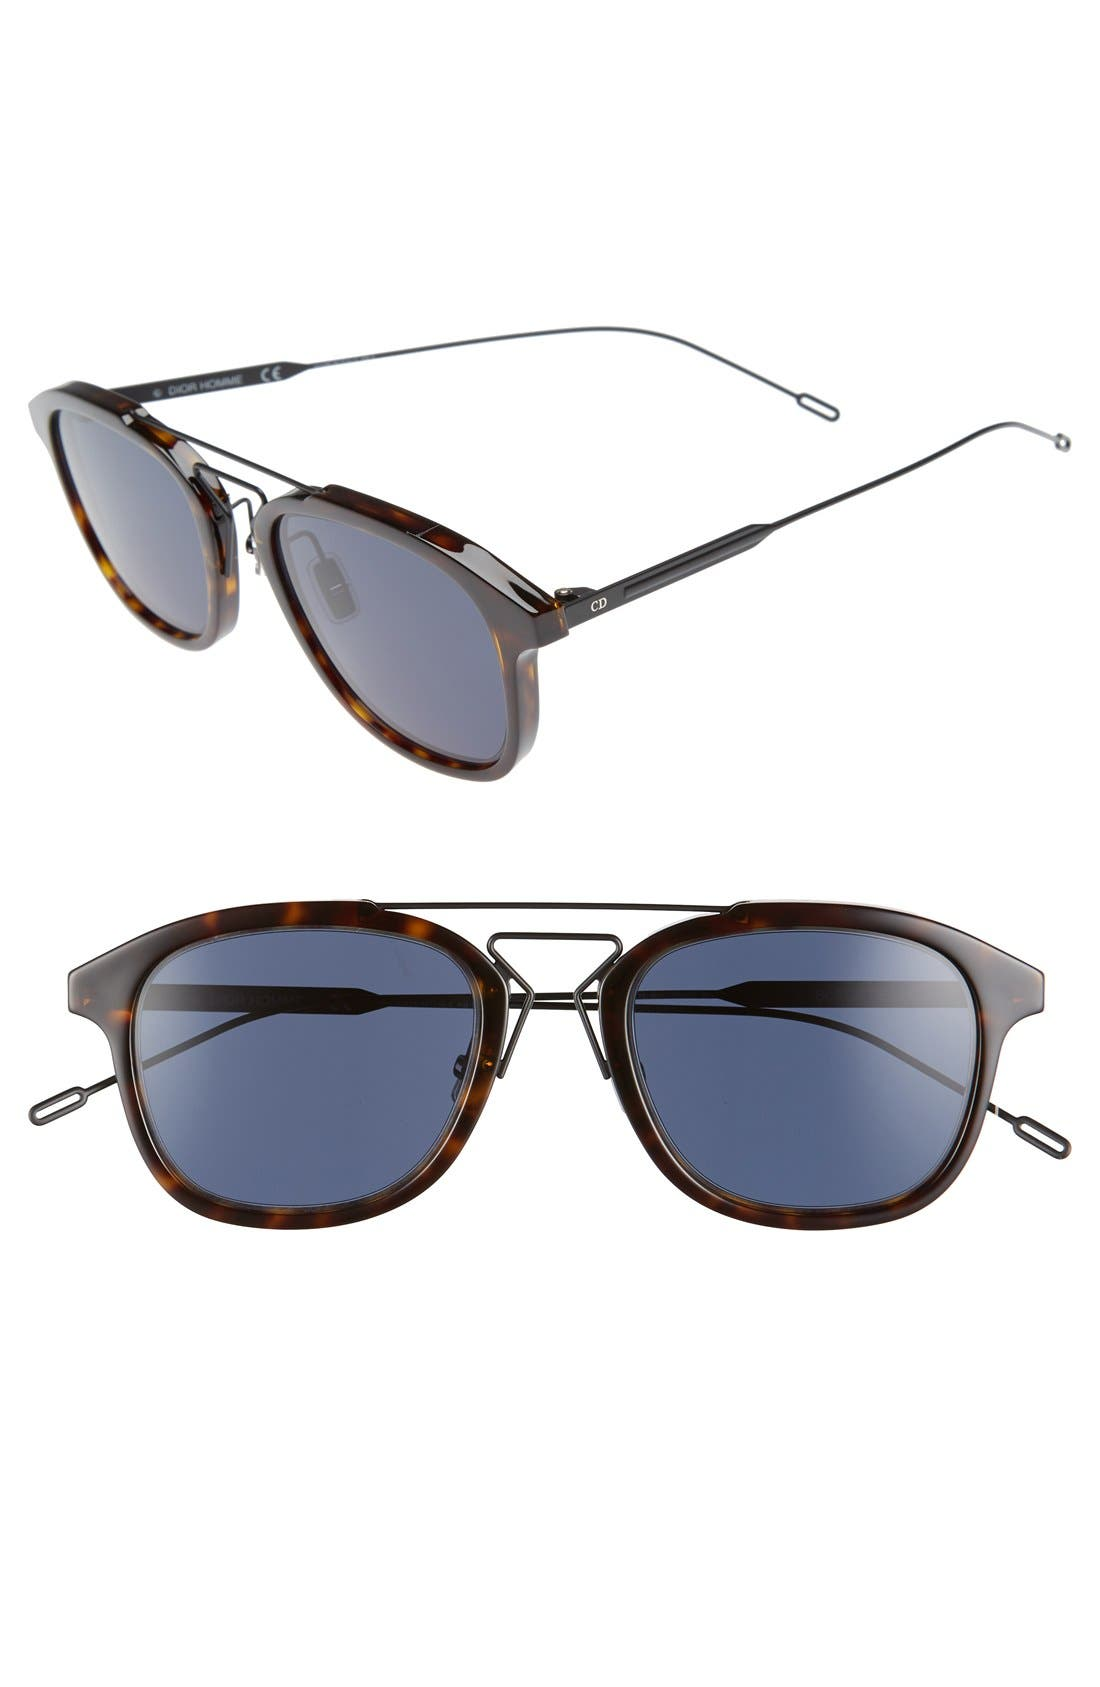 Main Image - Dior Homme 'Black Tie' 51mm Sunglasses